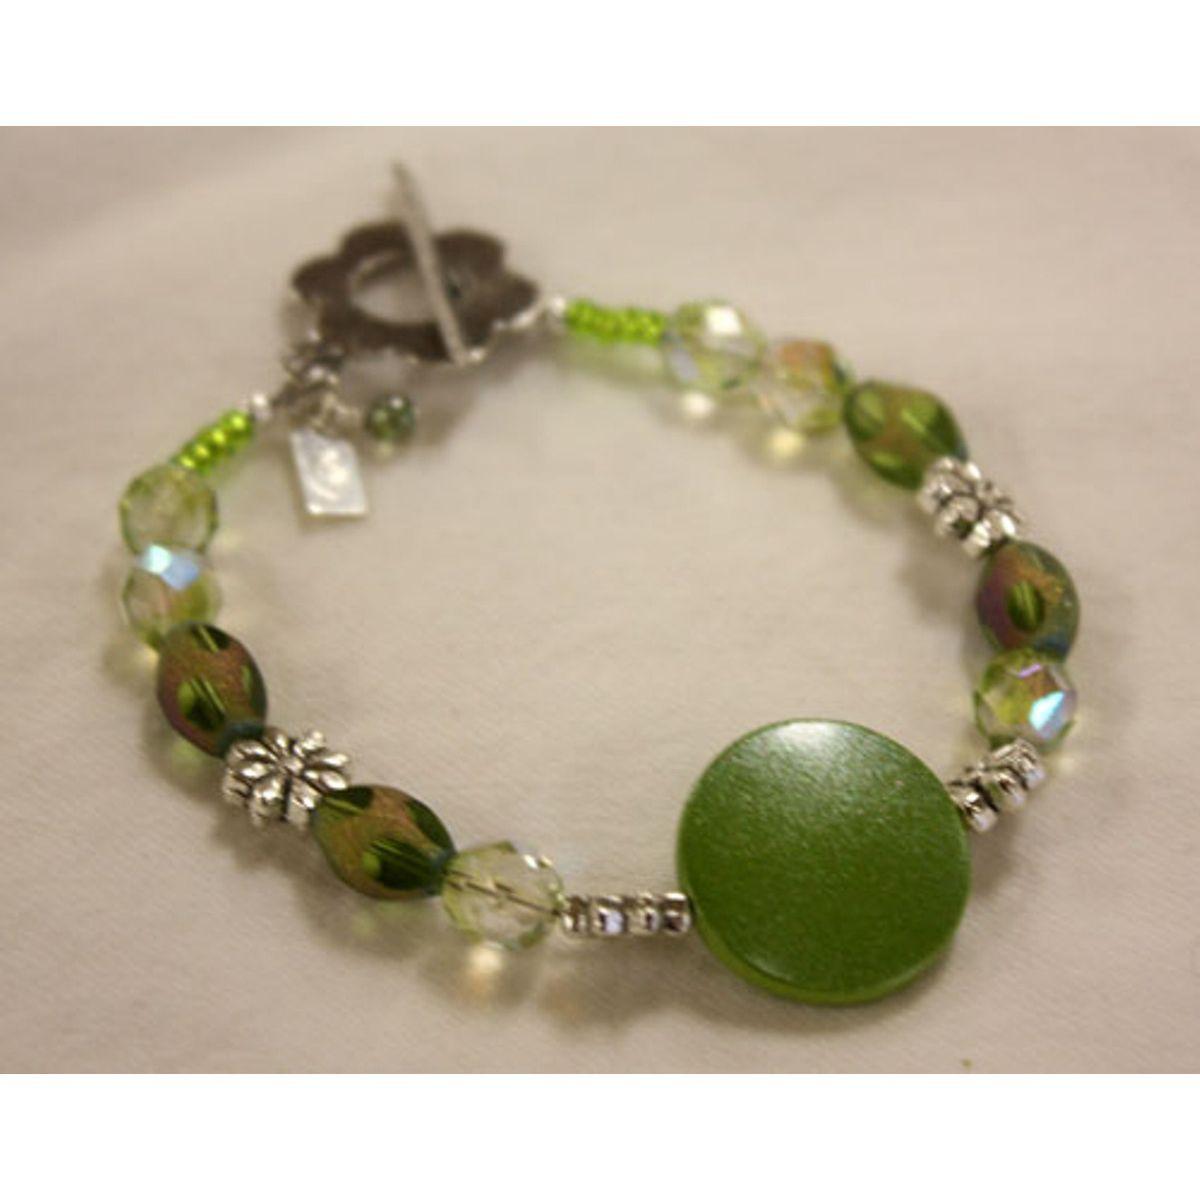 Sterling Silver 'Blossom' Bead Bracelet